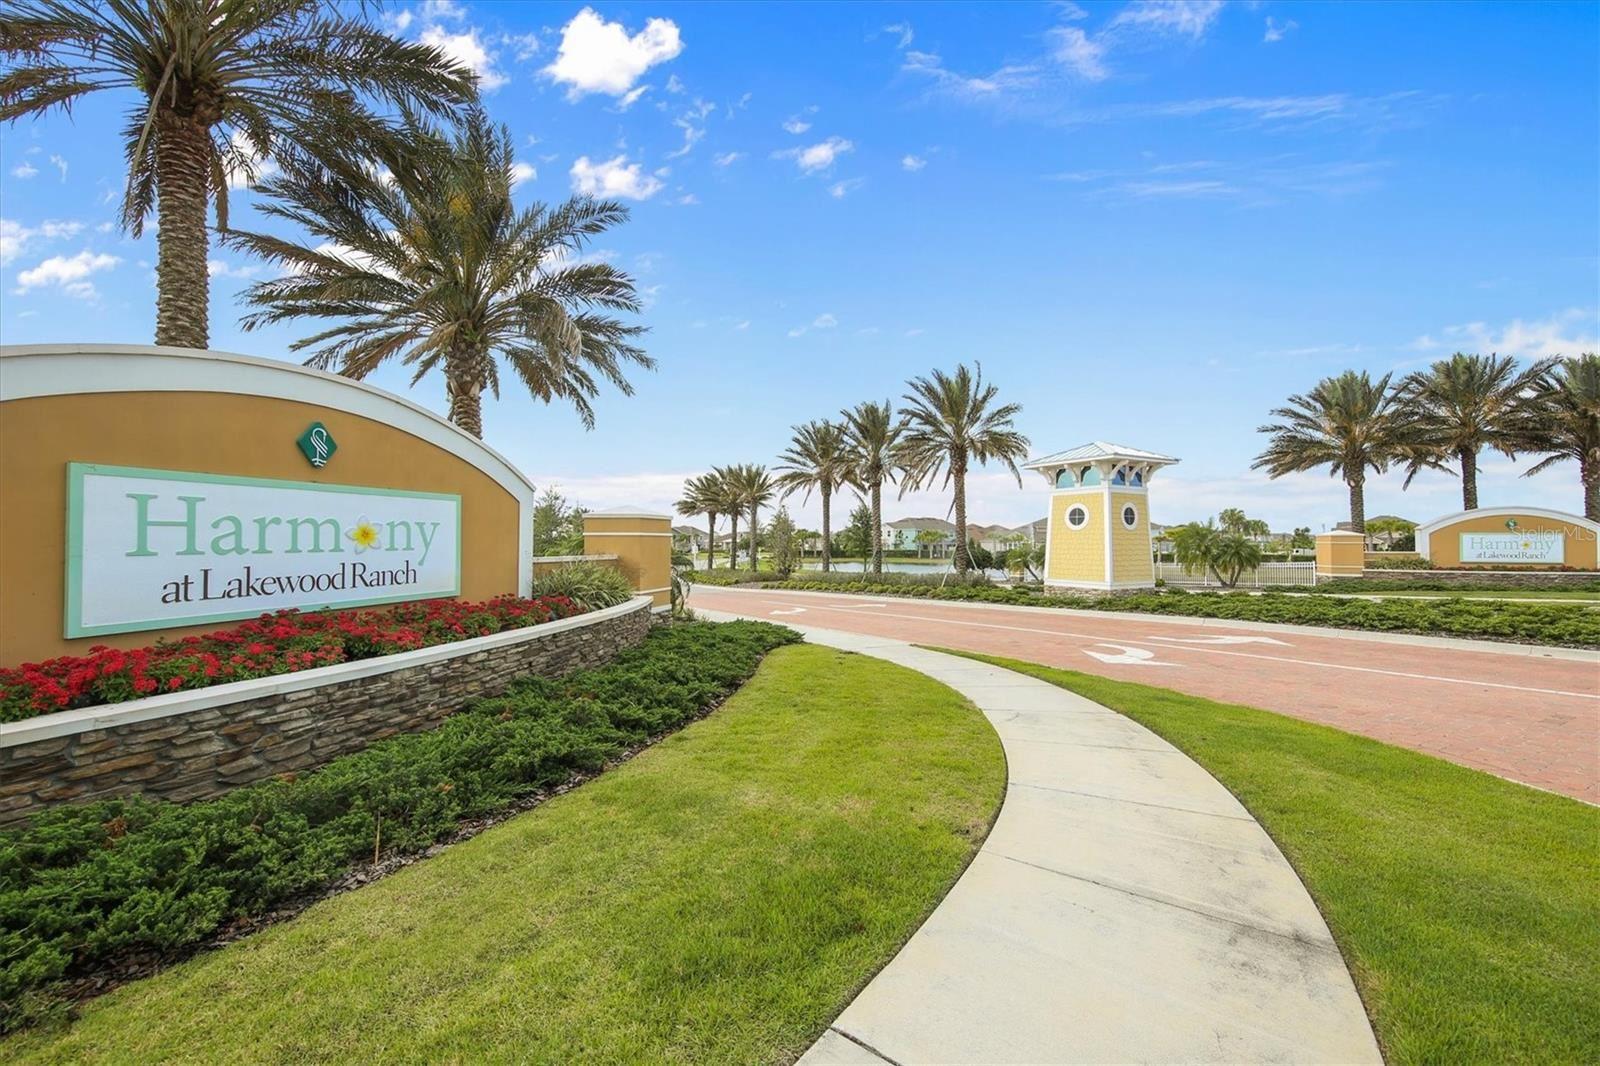 Photo of 5065 SKYVIEW LANE, BRADENTON, FL 34211 (MLS # A4504393)